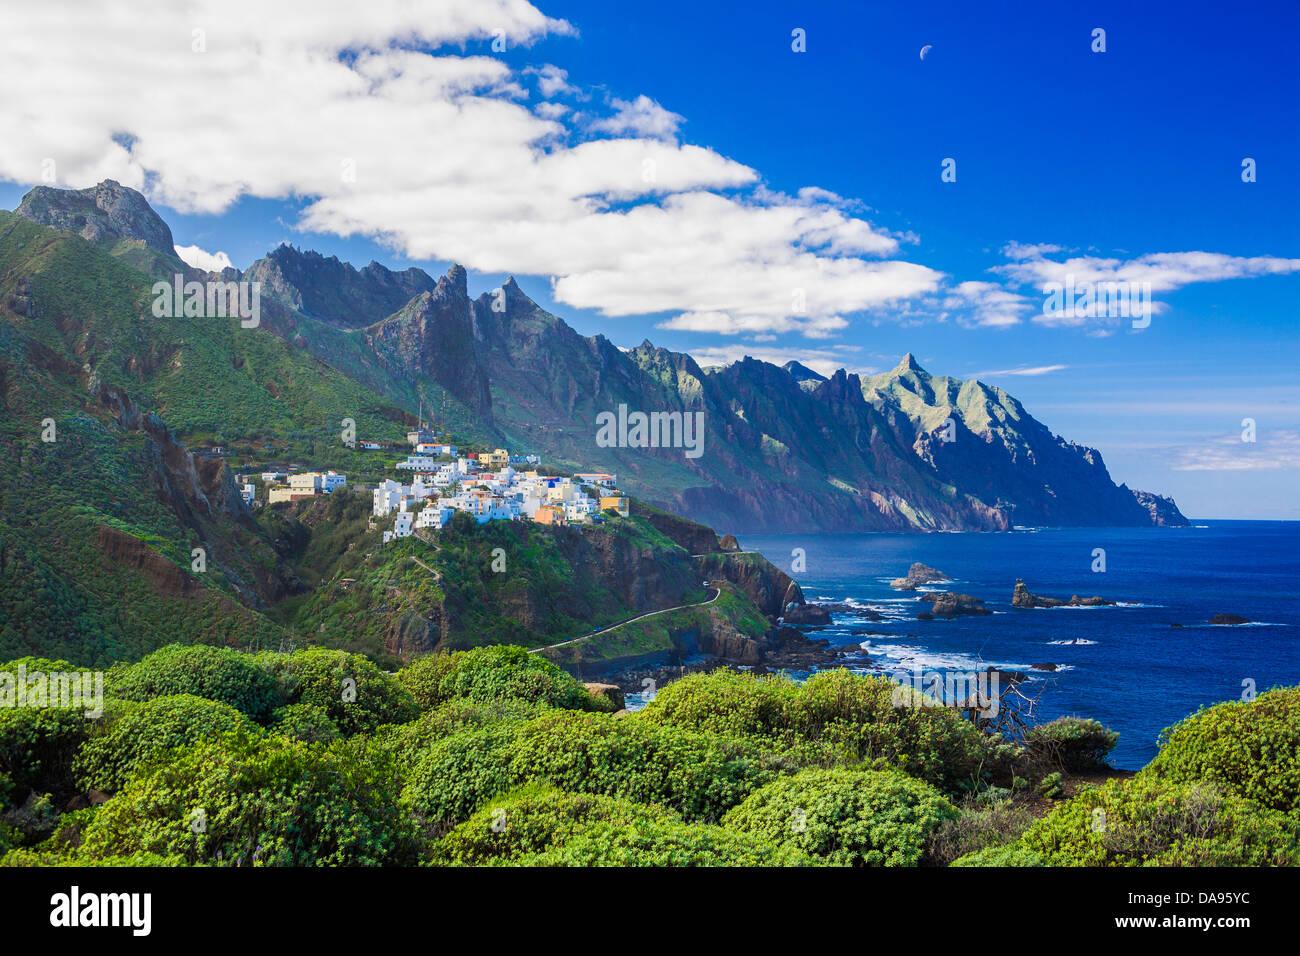 Almaciga, Canary Islands, Canaries, Taganana, Taganana Coast, Tenerife, Teneriffa, blue, cliff, coast, island, mountain, - Stock Image